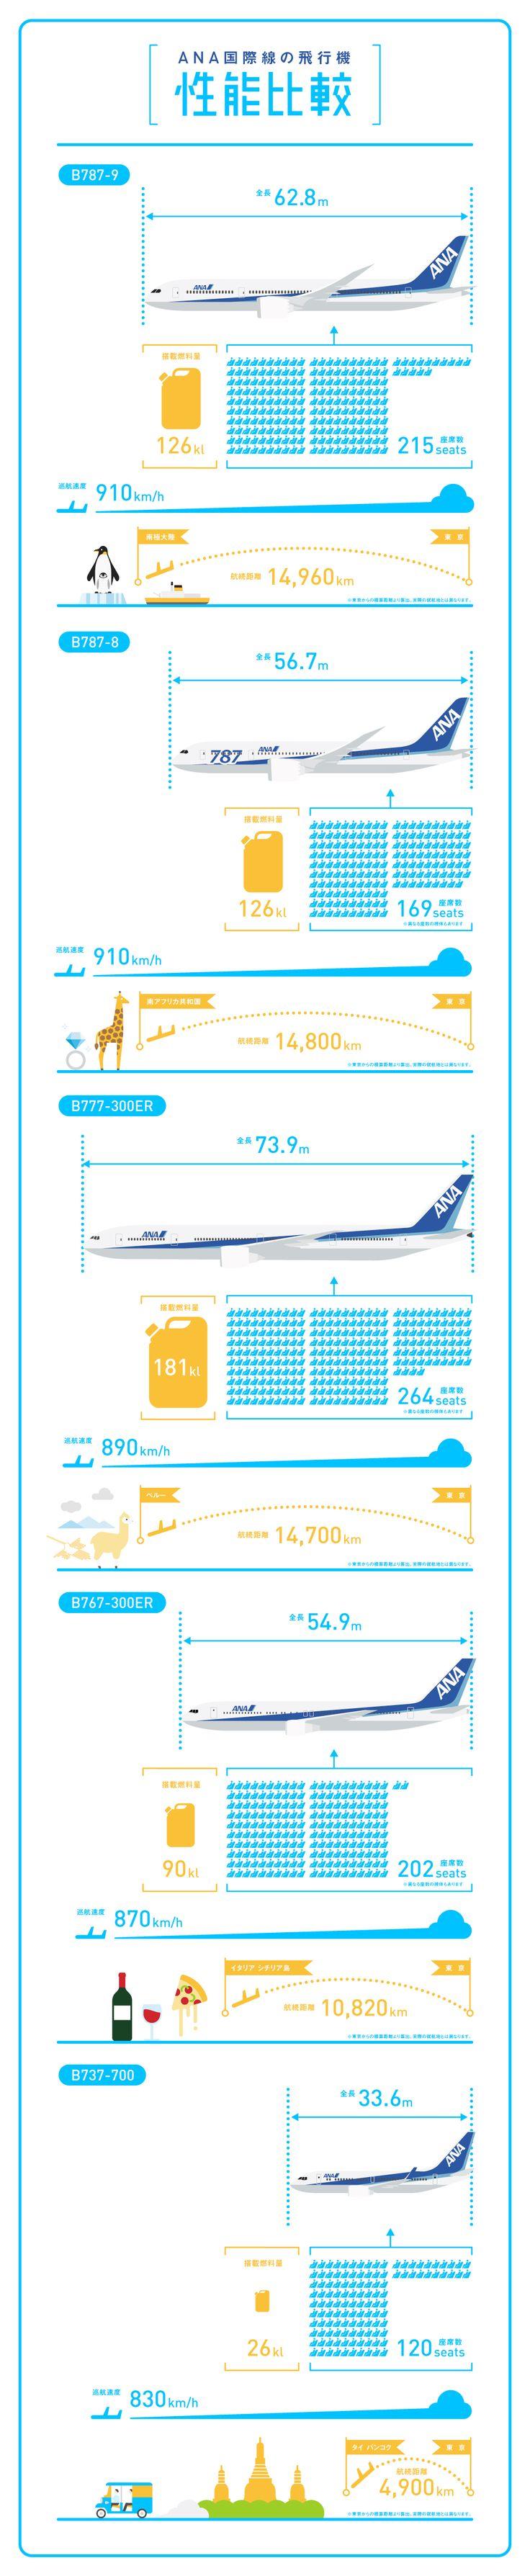 ANA国際線の飛行機 性能比較|Infographics|ANA Travel & Life